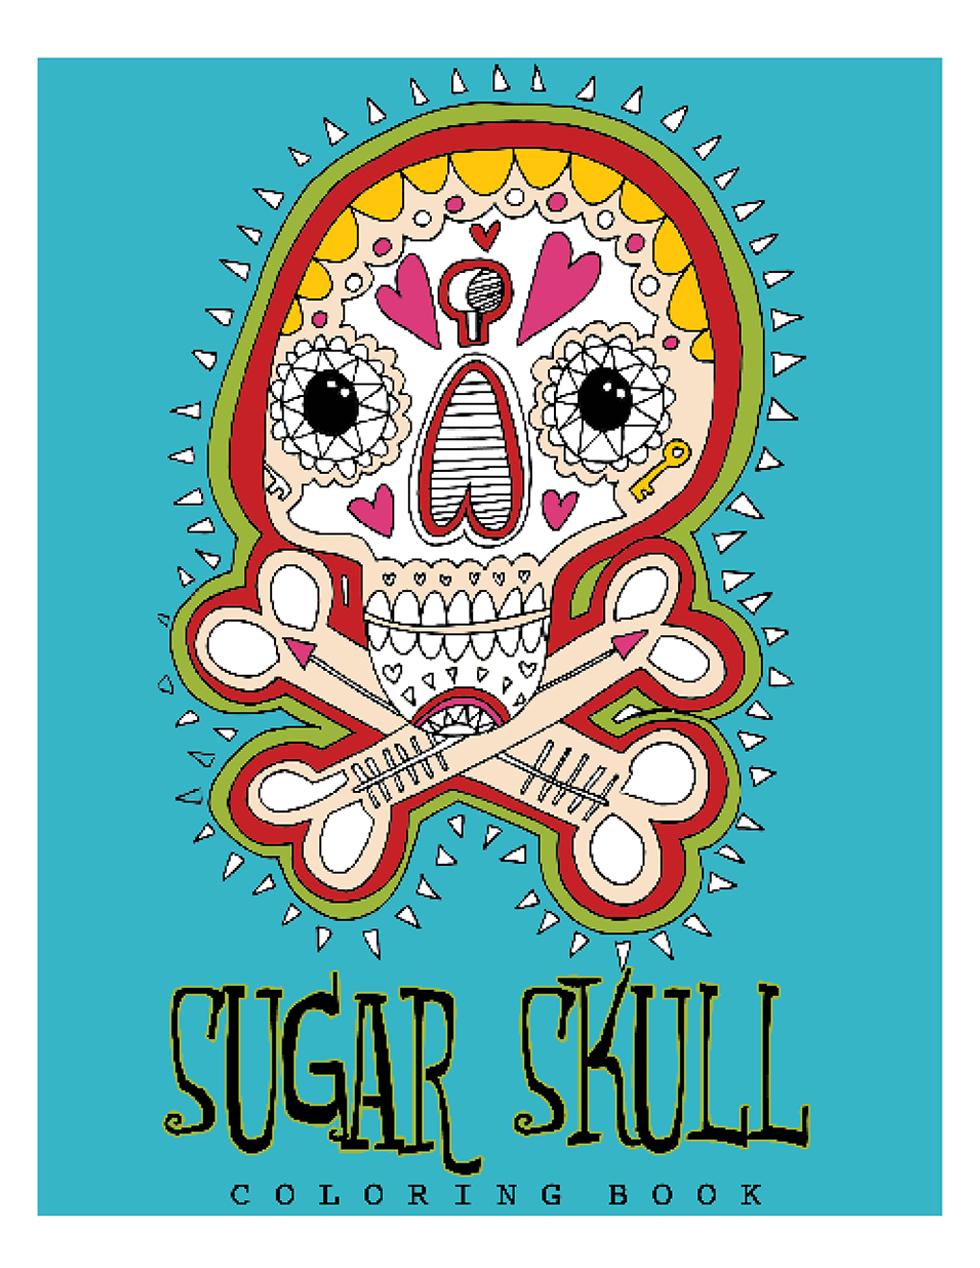 Happies - Sugar Skull Coloring Book